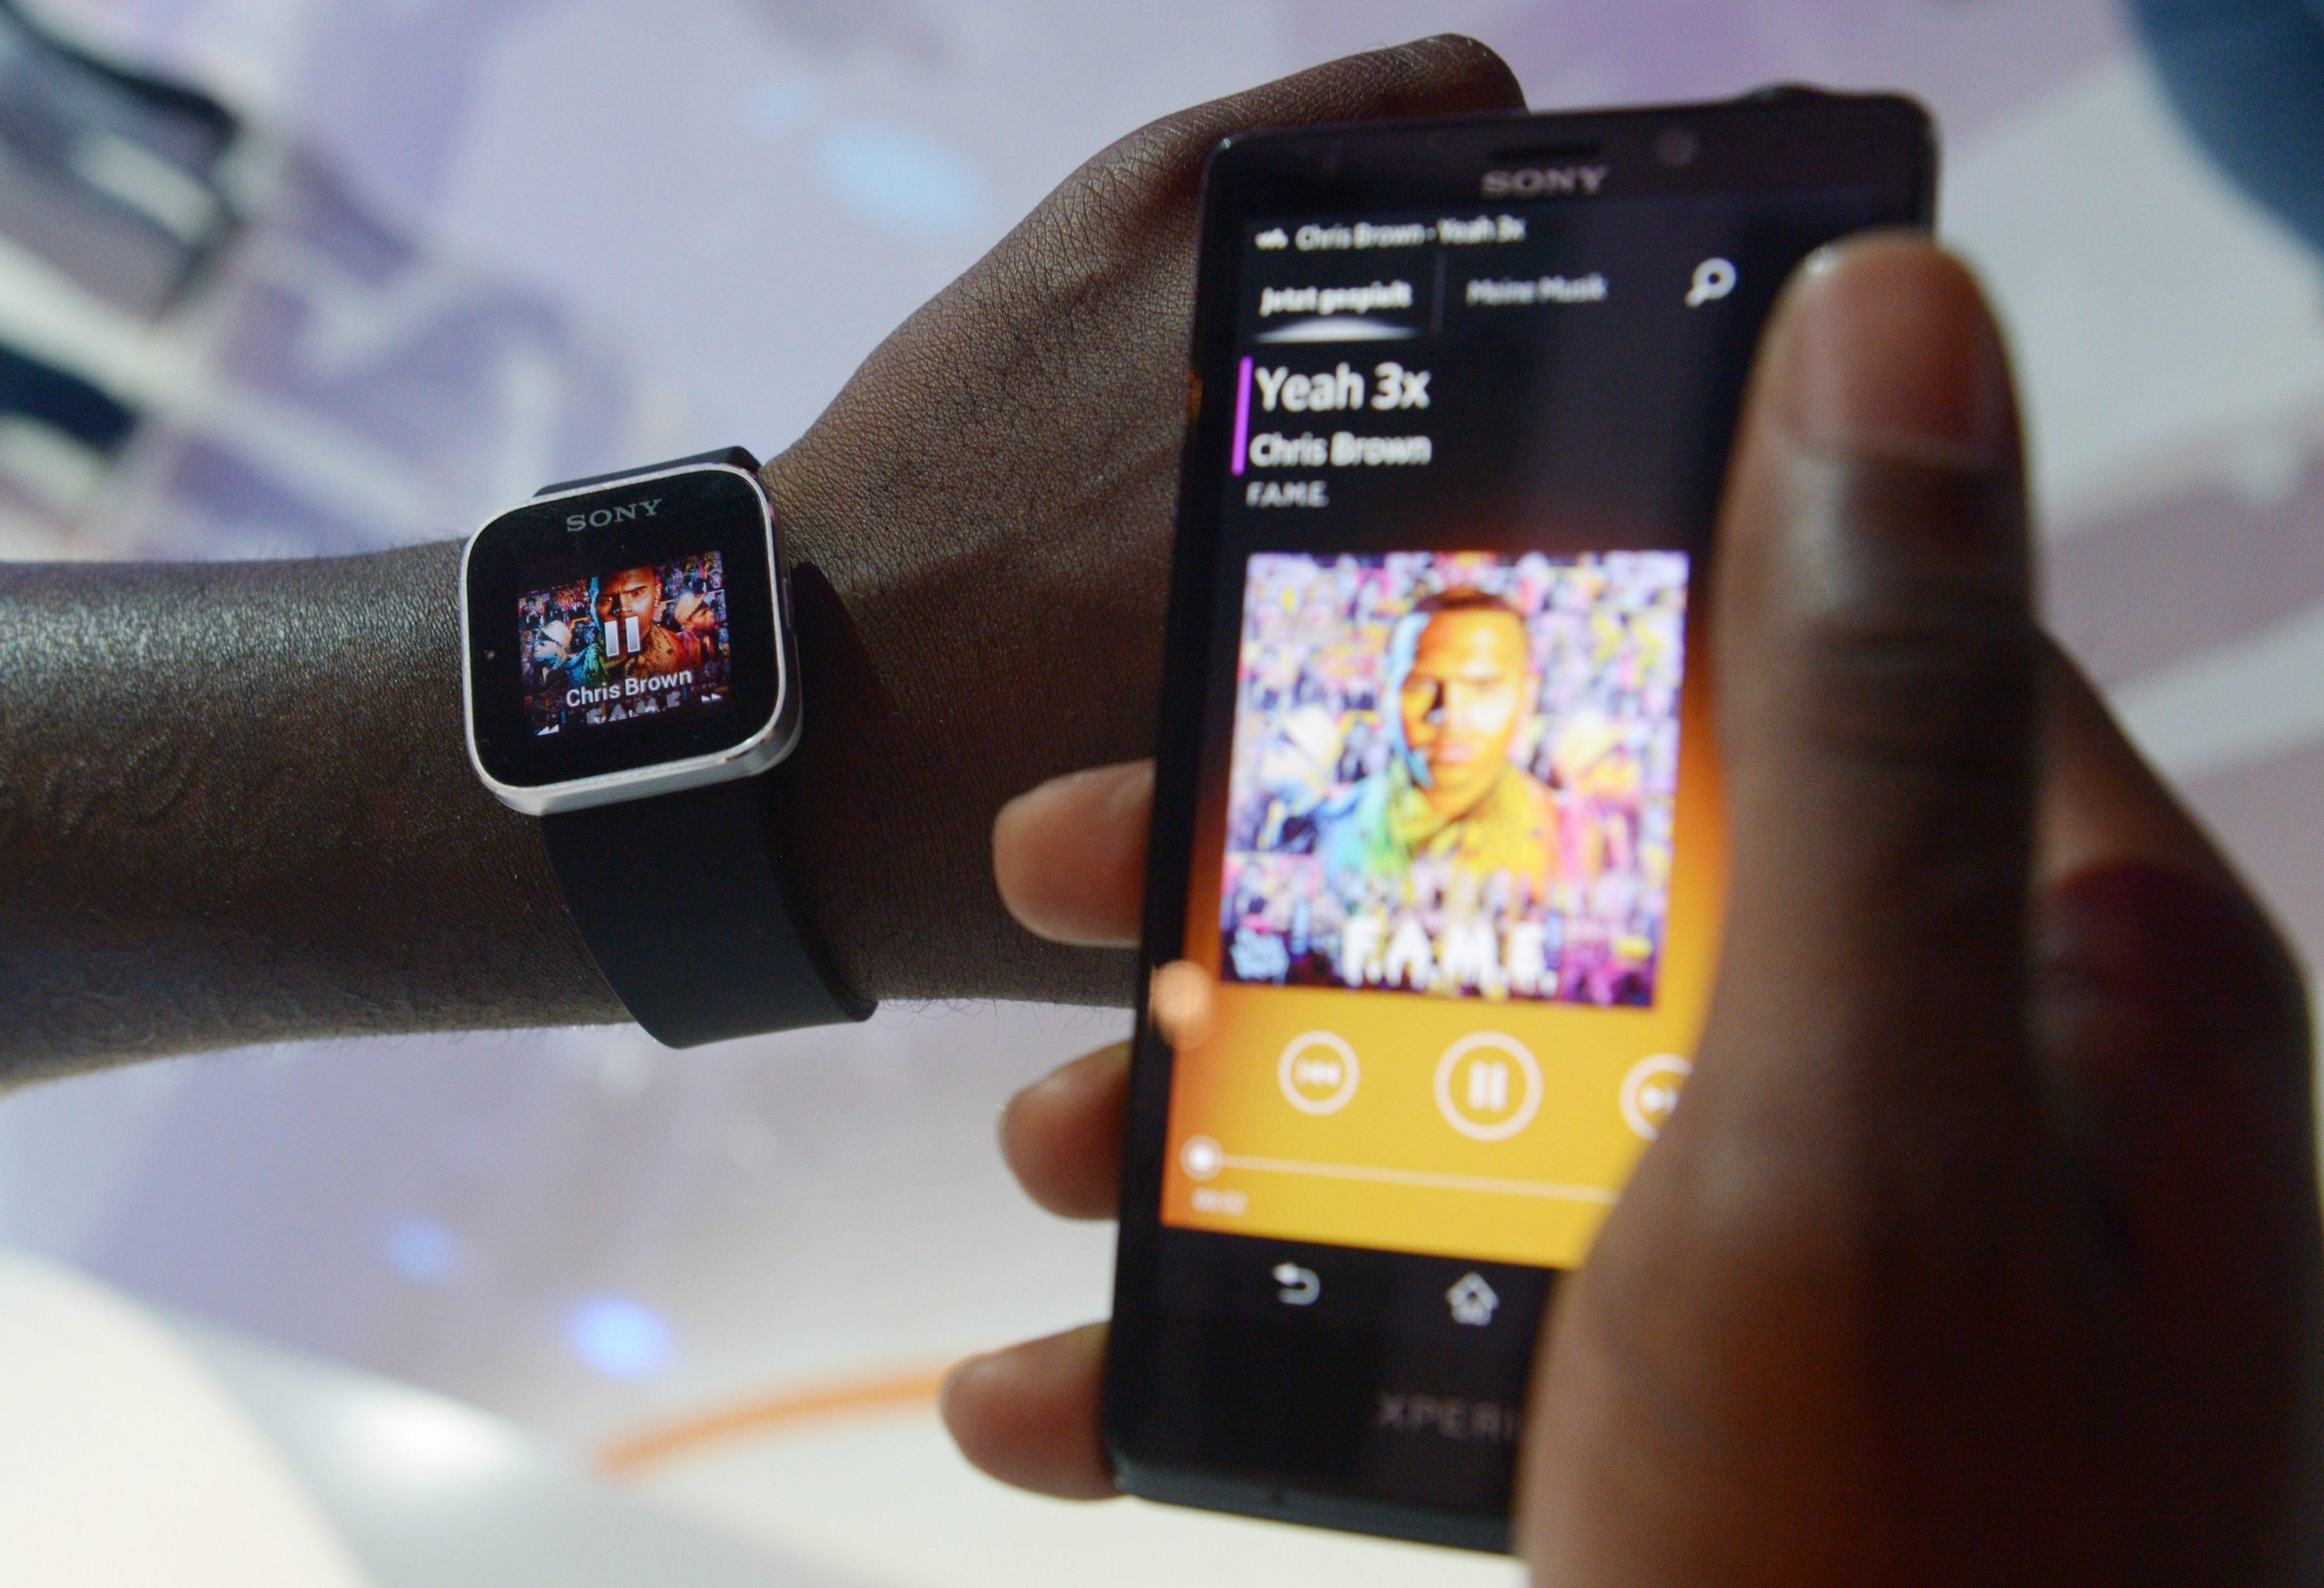 Apple патентовала гъвкав часовник още през 2011